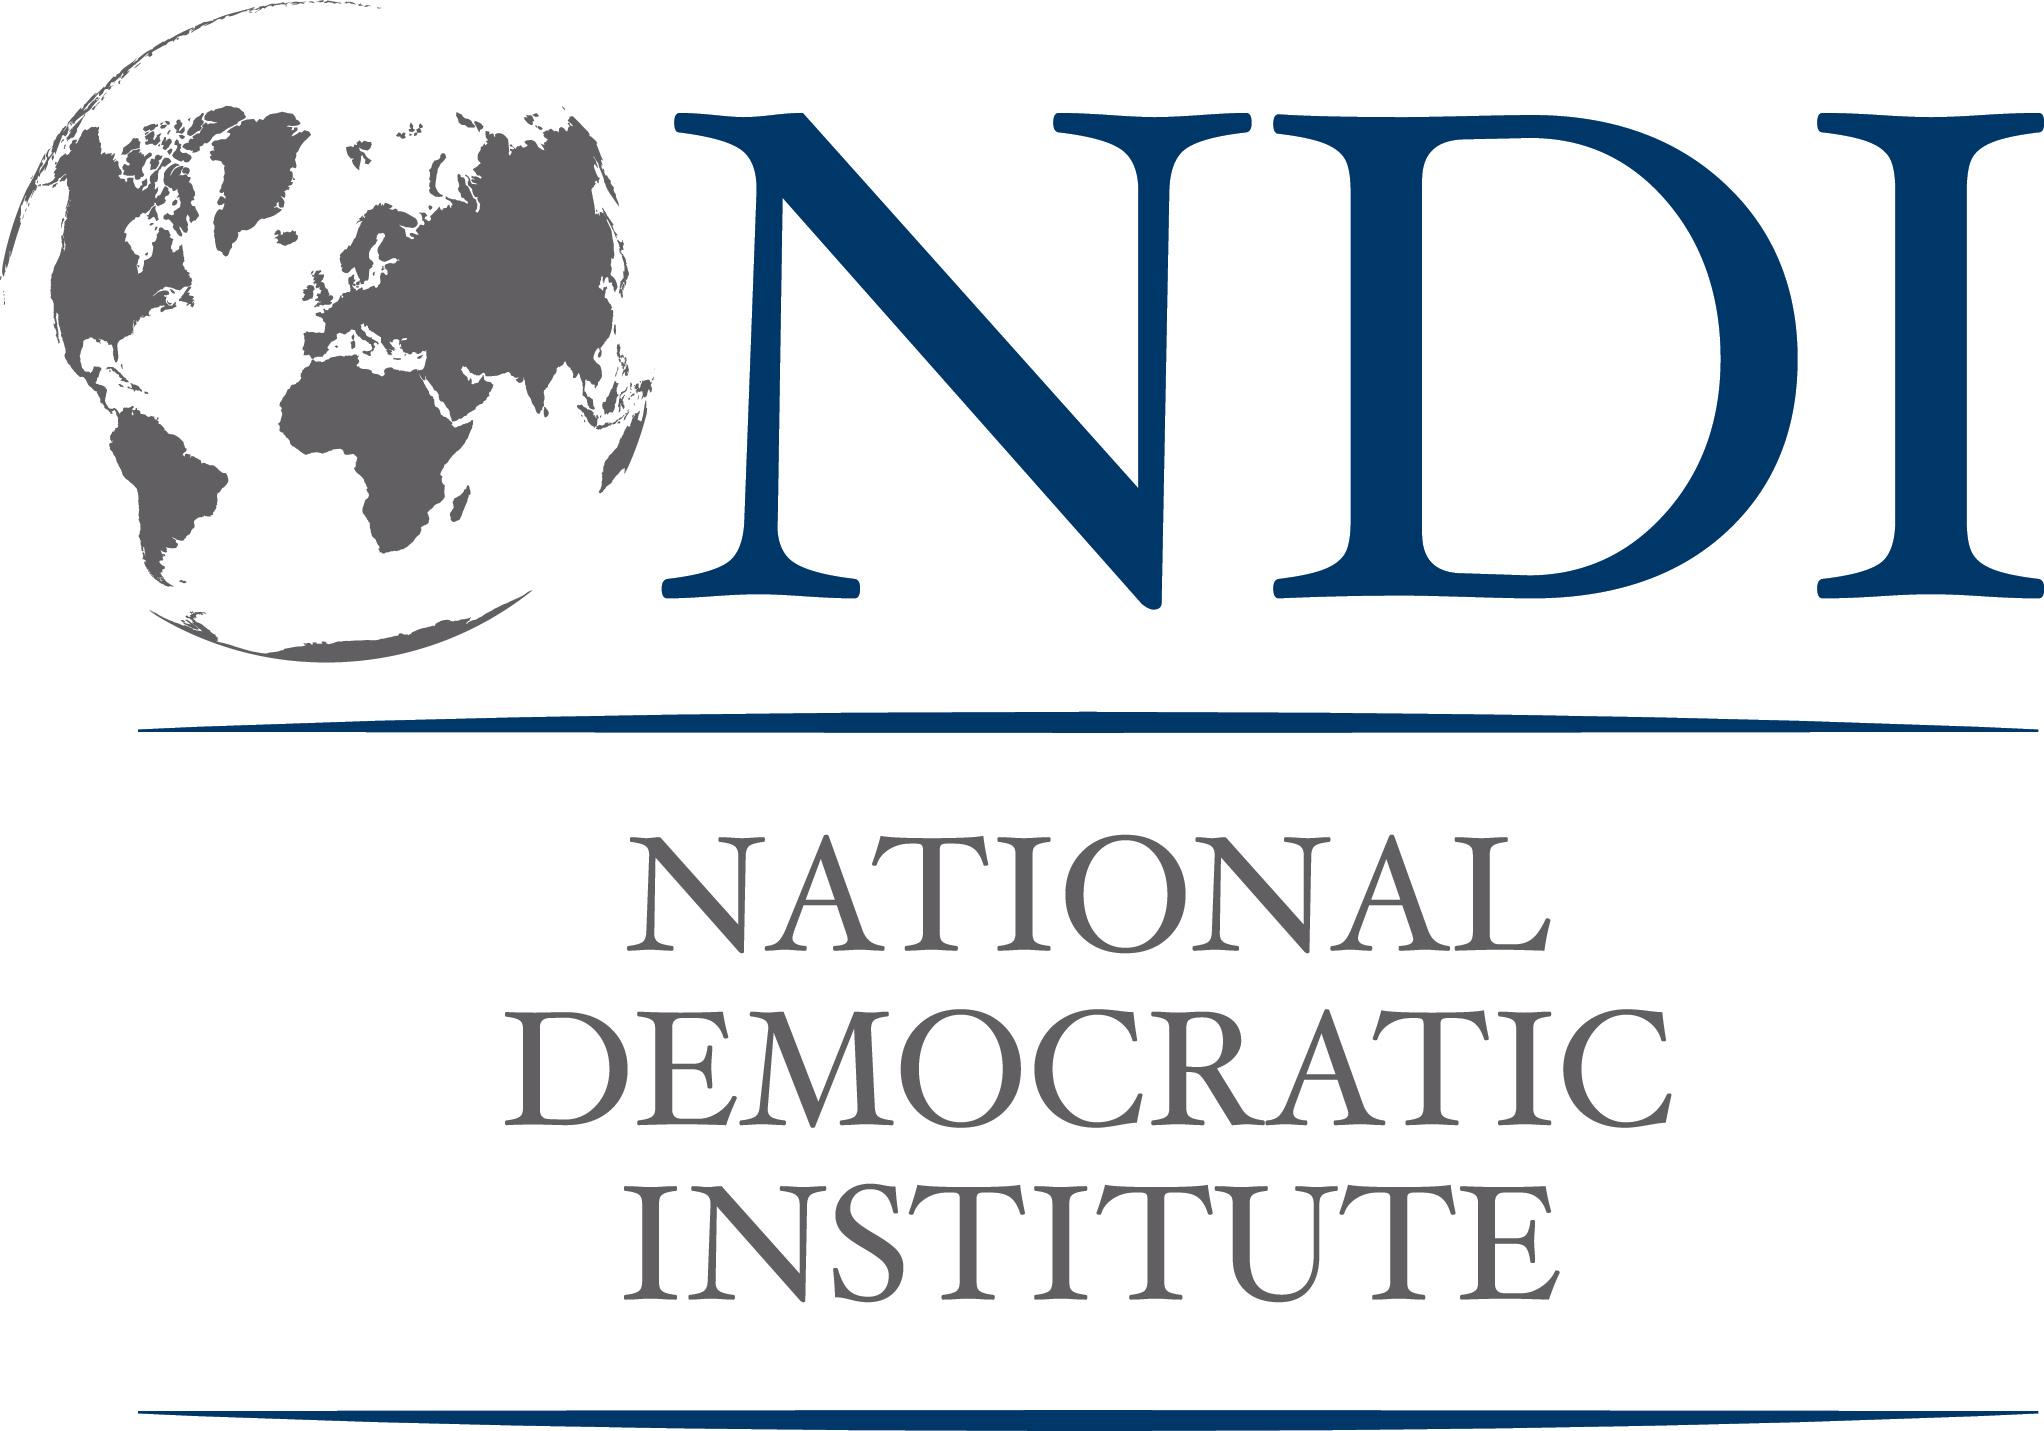 National_Democratic_Institute_(NDI)_Logo.jpg